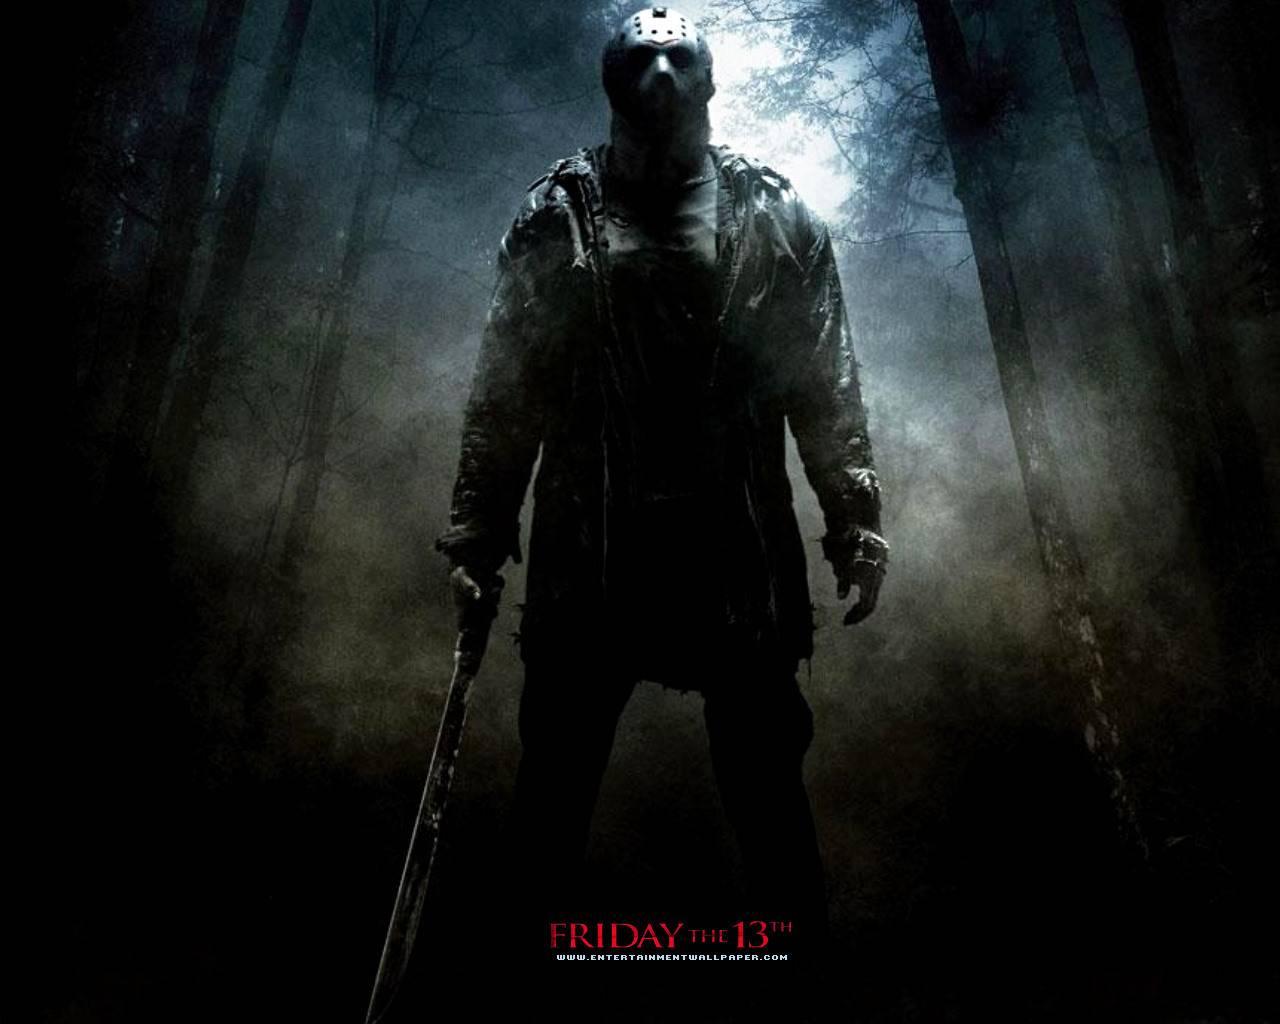 Friday the 13th (2009 Wallpaper) - Slasher Films Wallpaper